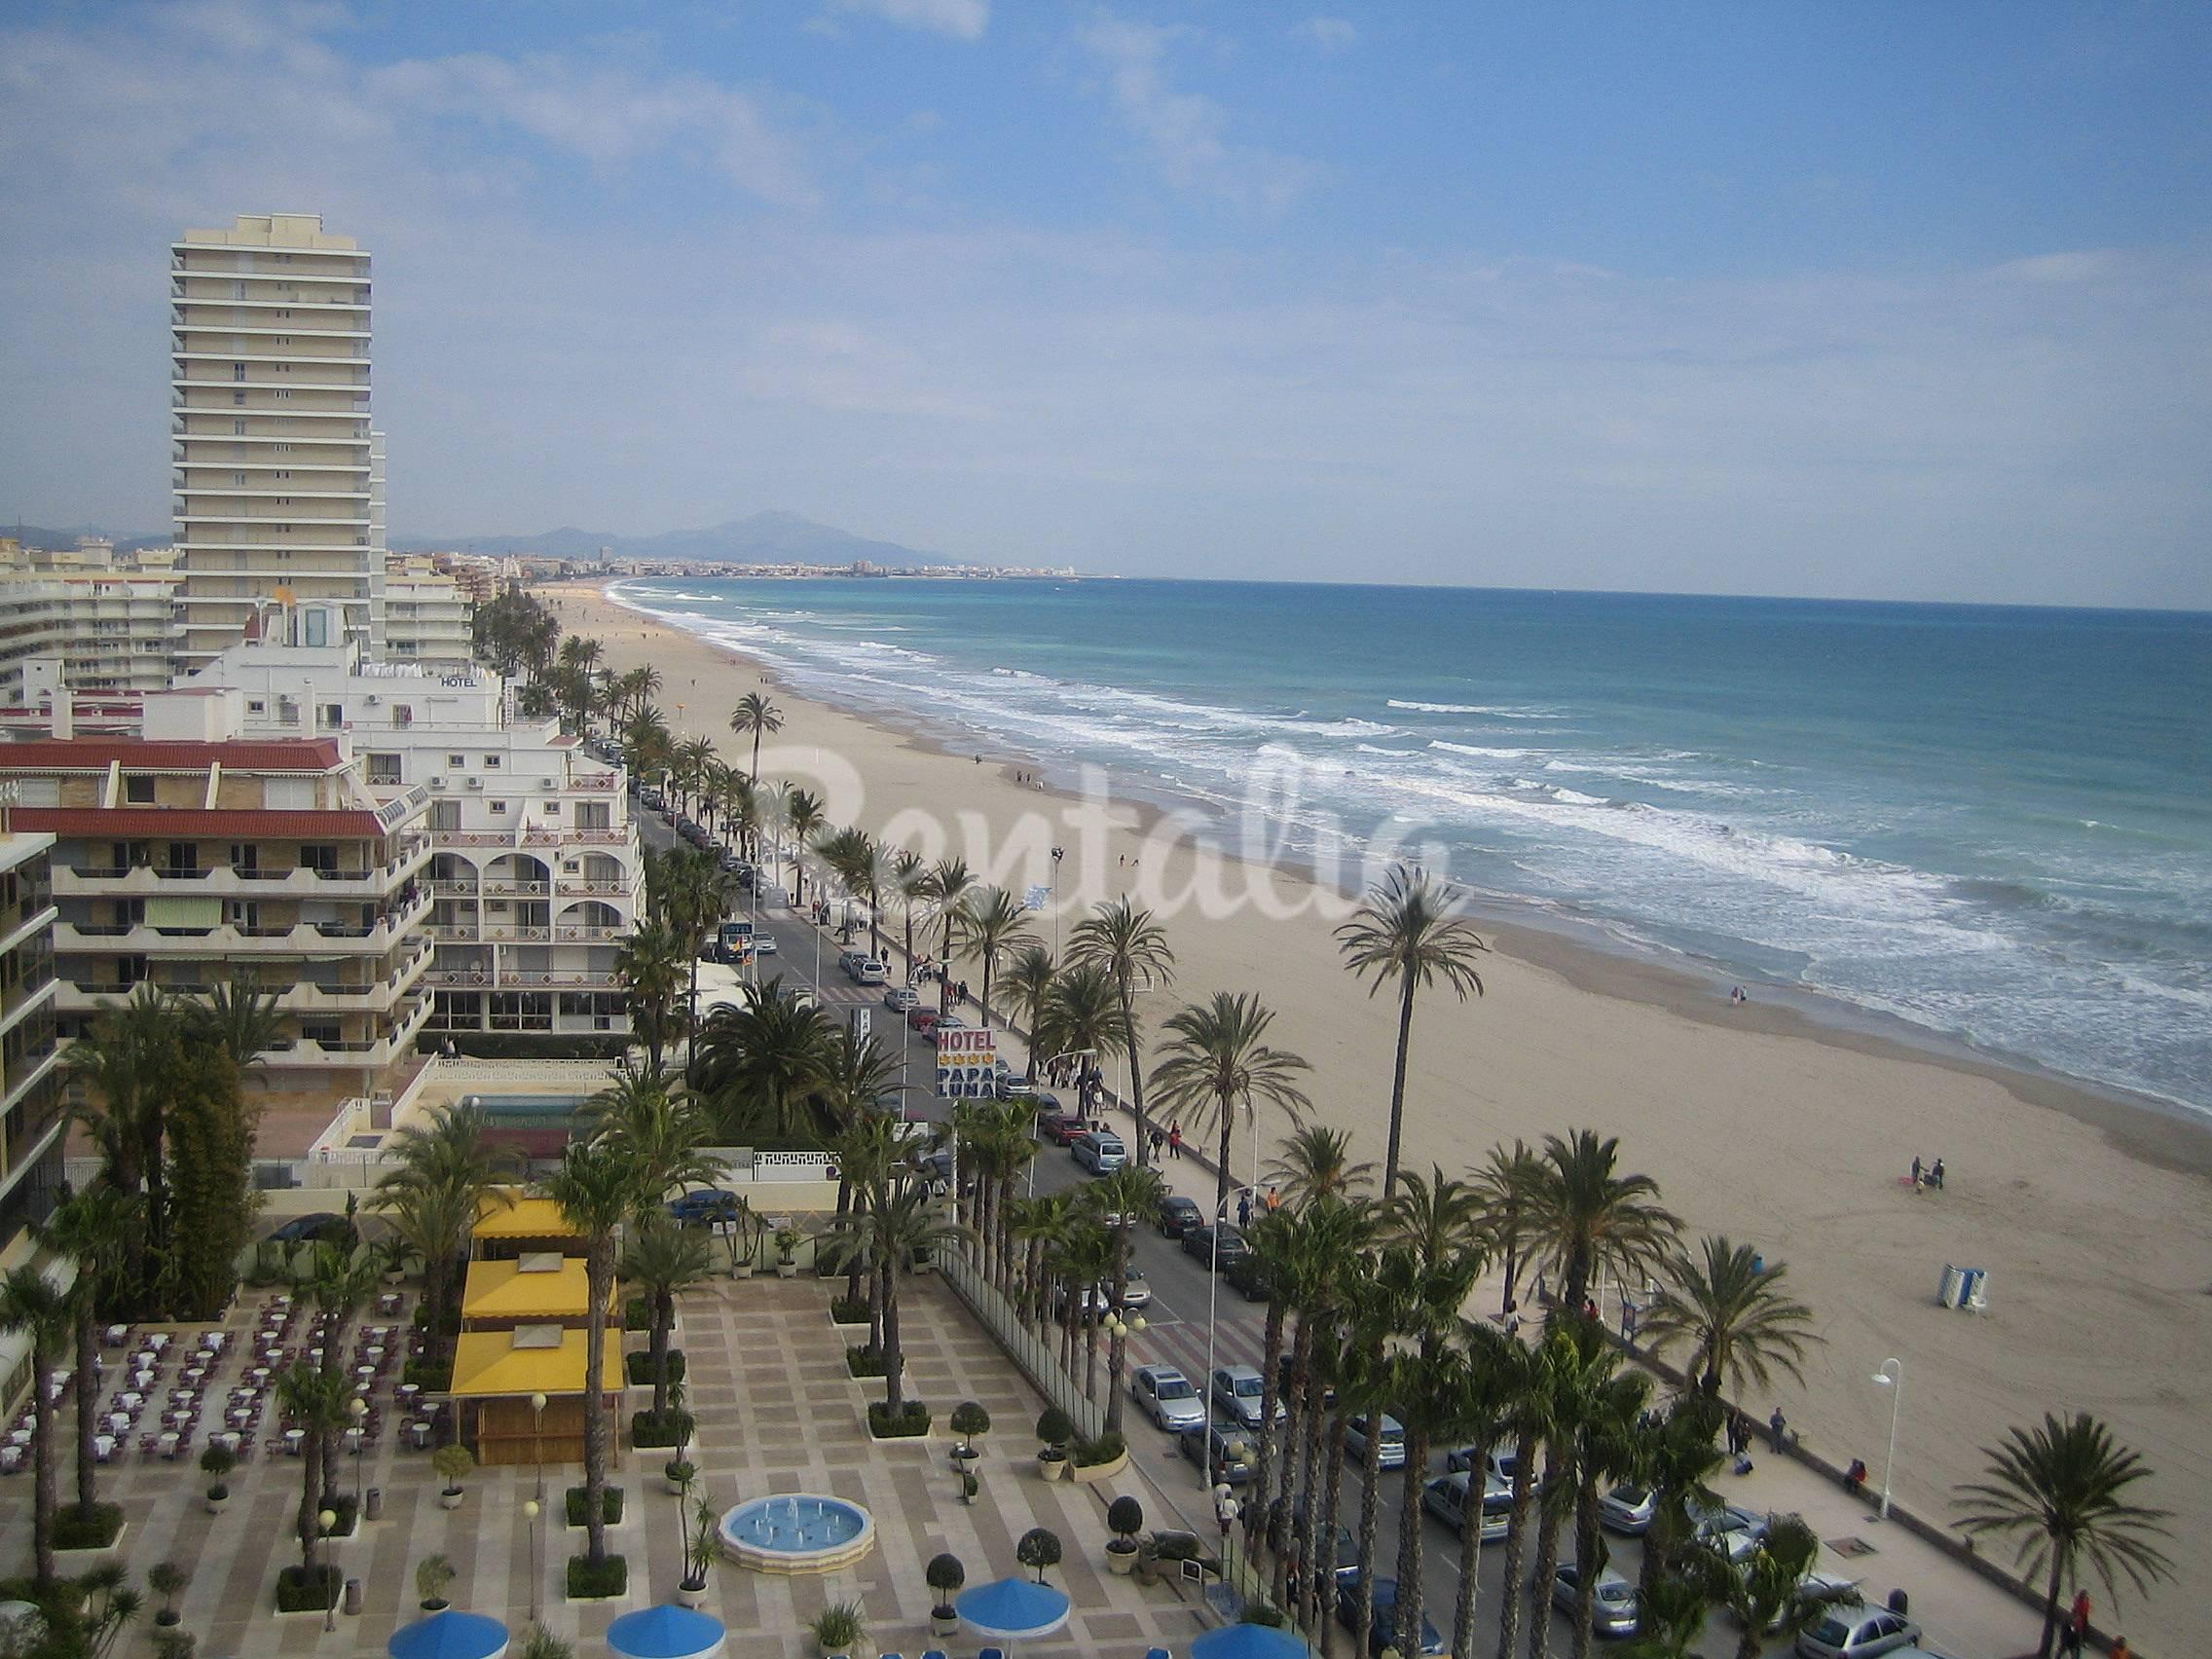 Apartamentos 50 m playa con piscina pe iscola pe scola castell n castell n costa del - Hoteles en castellon con piscina ...